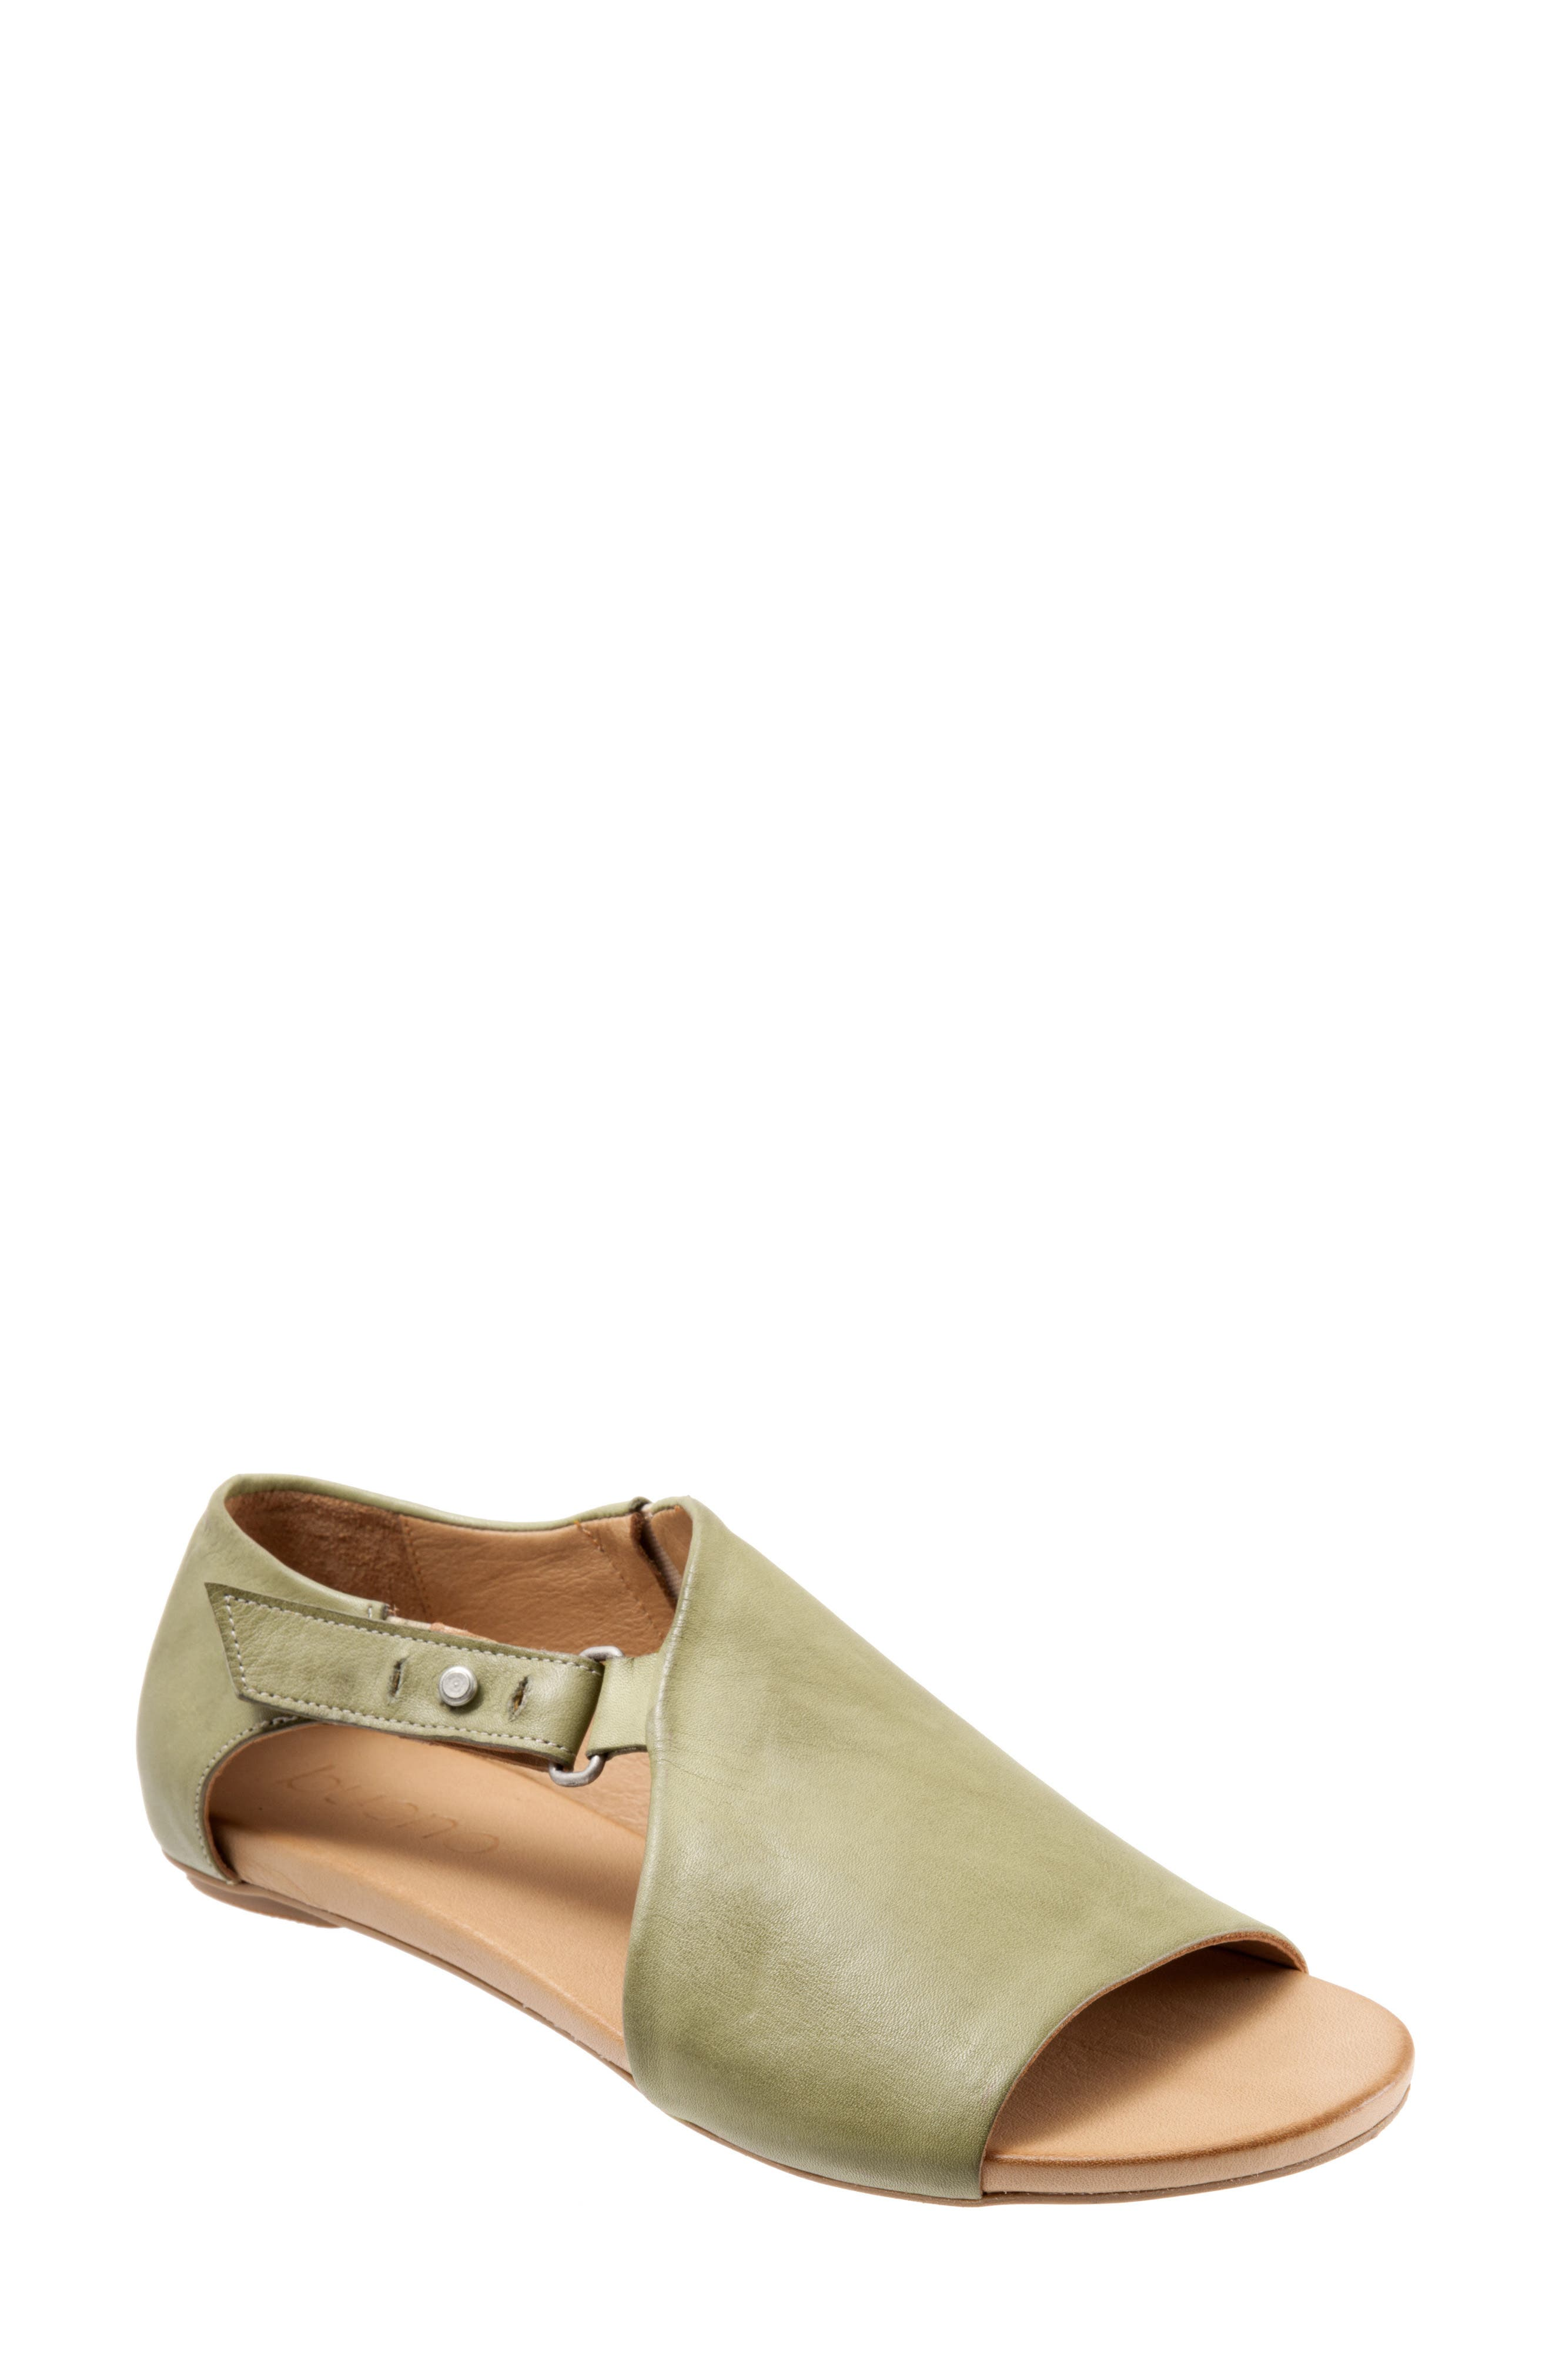 Kale Sandal,                         Main,                         color, Moss Leather